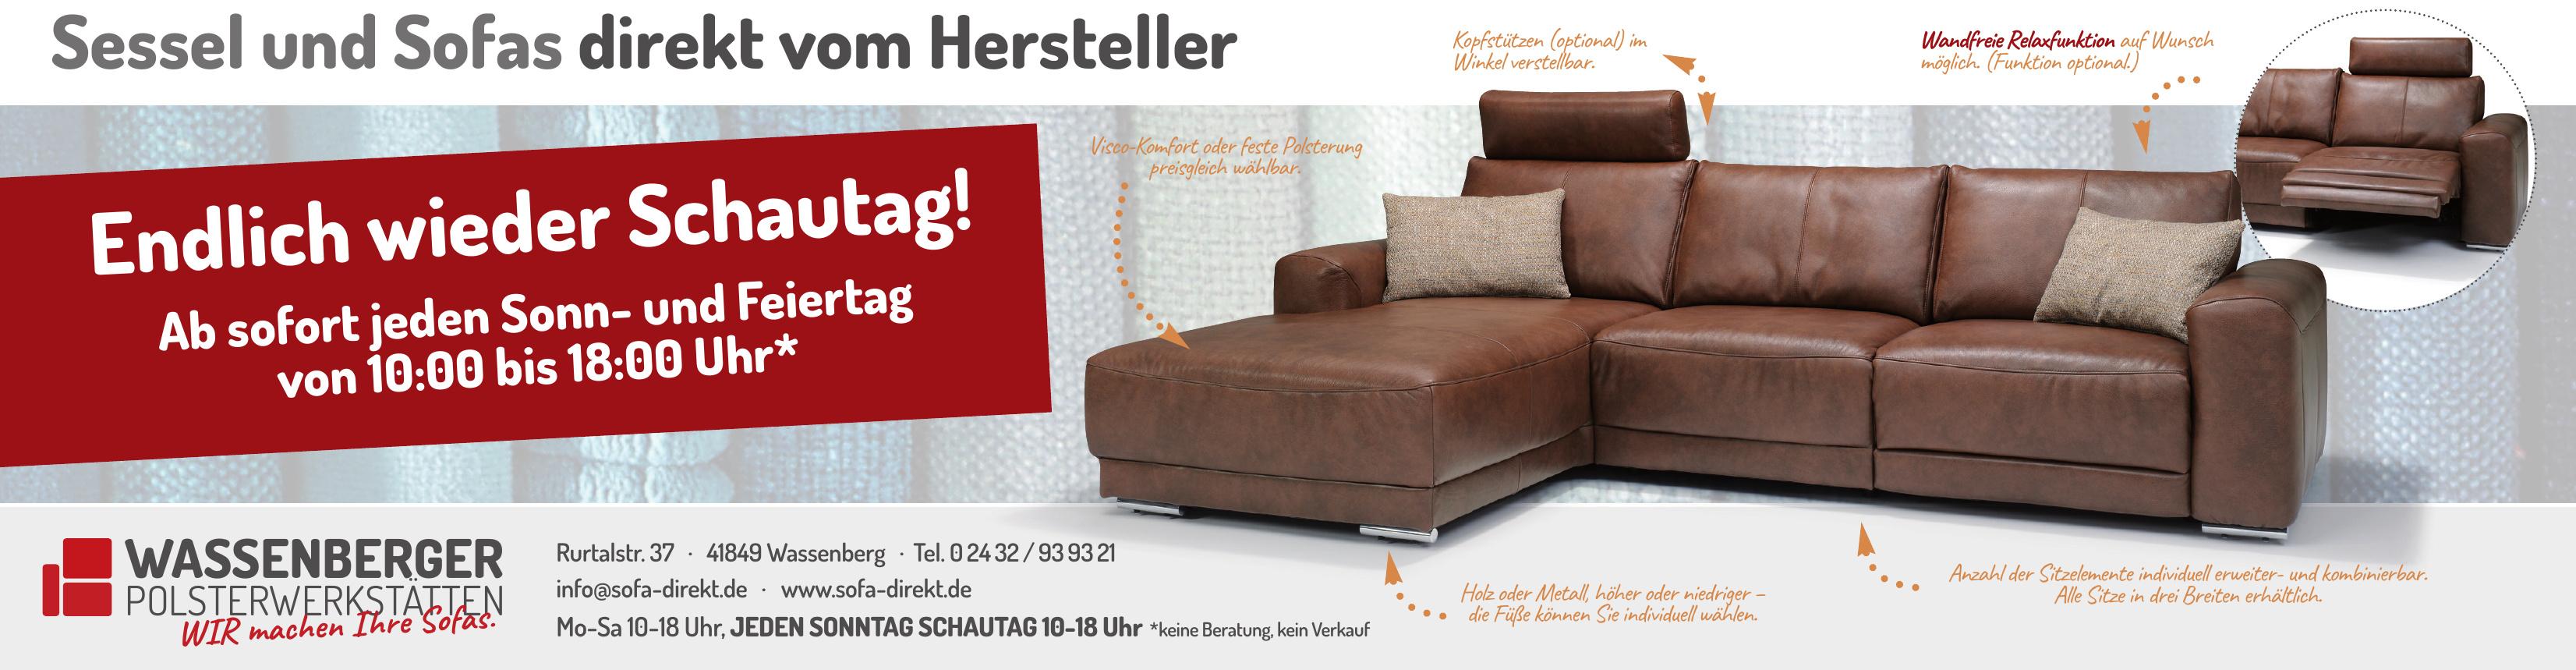 Wassenberger Polsterwerkstätten GmbH